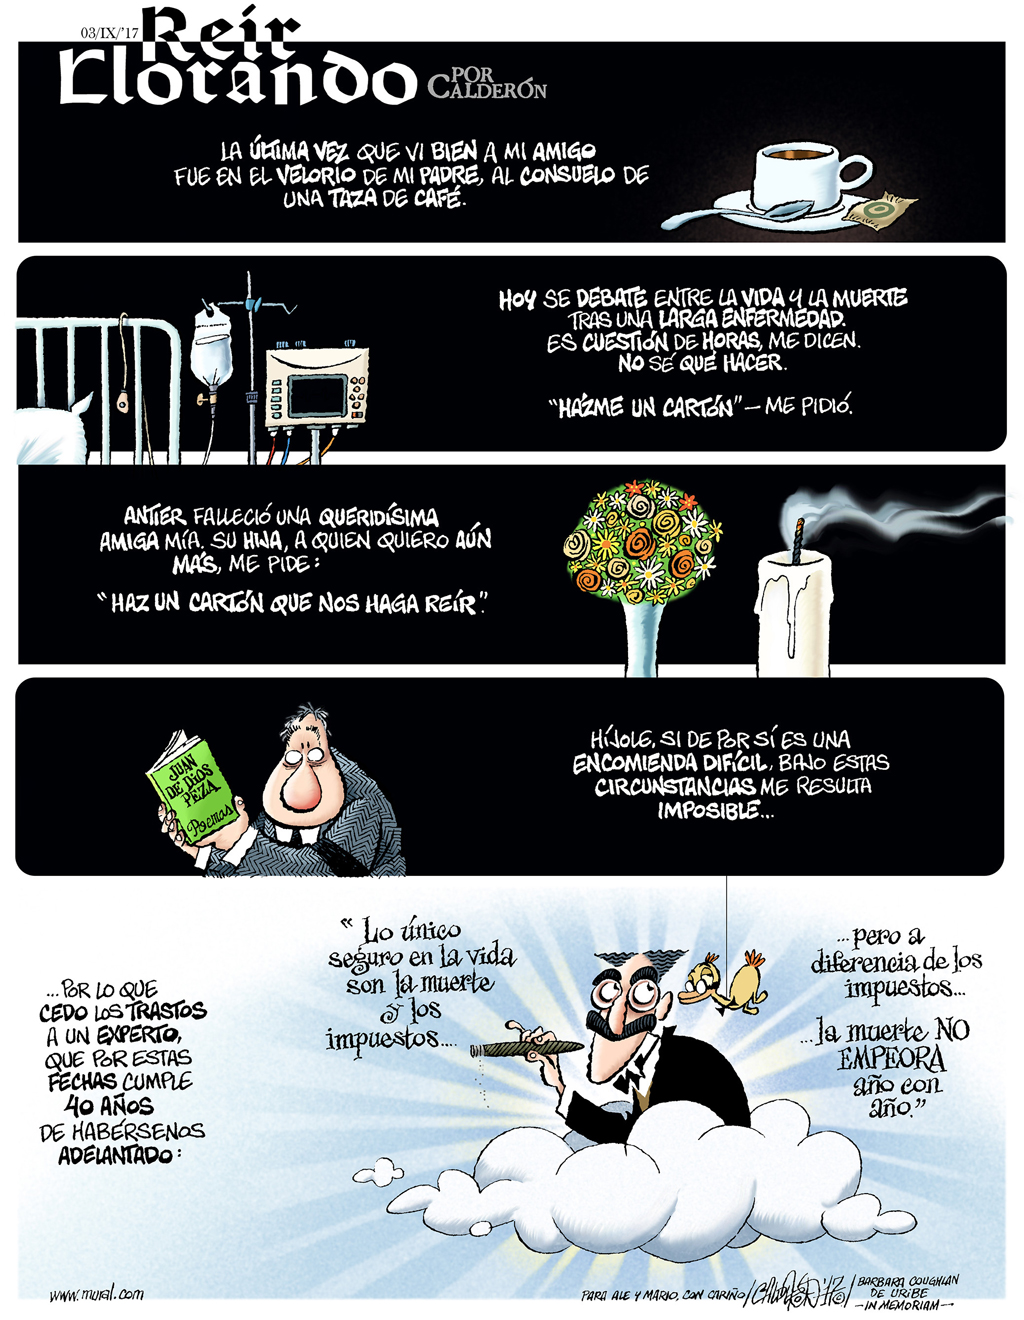 Reír llorando - Calderón